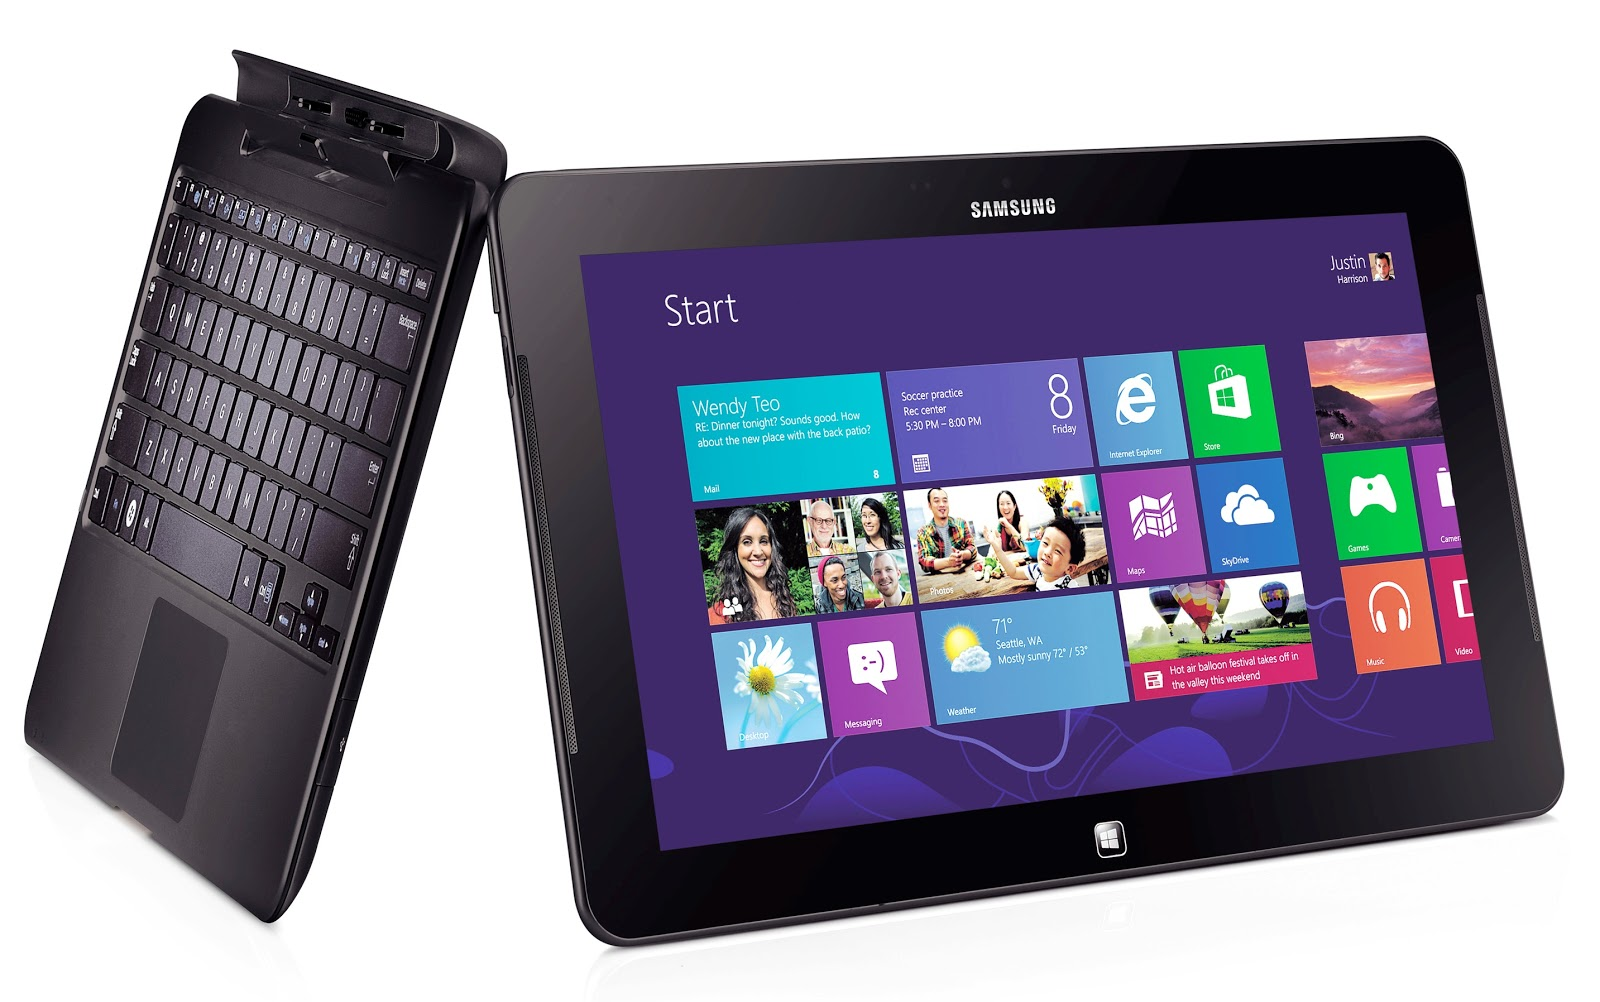 Samsung ATIV Smart PC 10